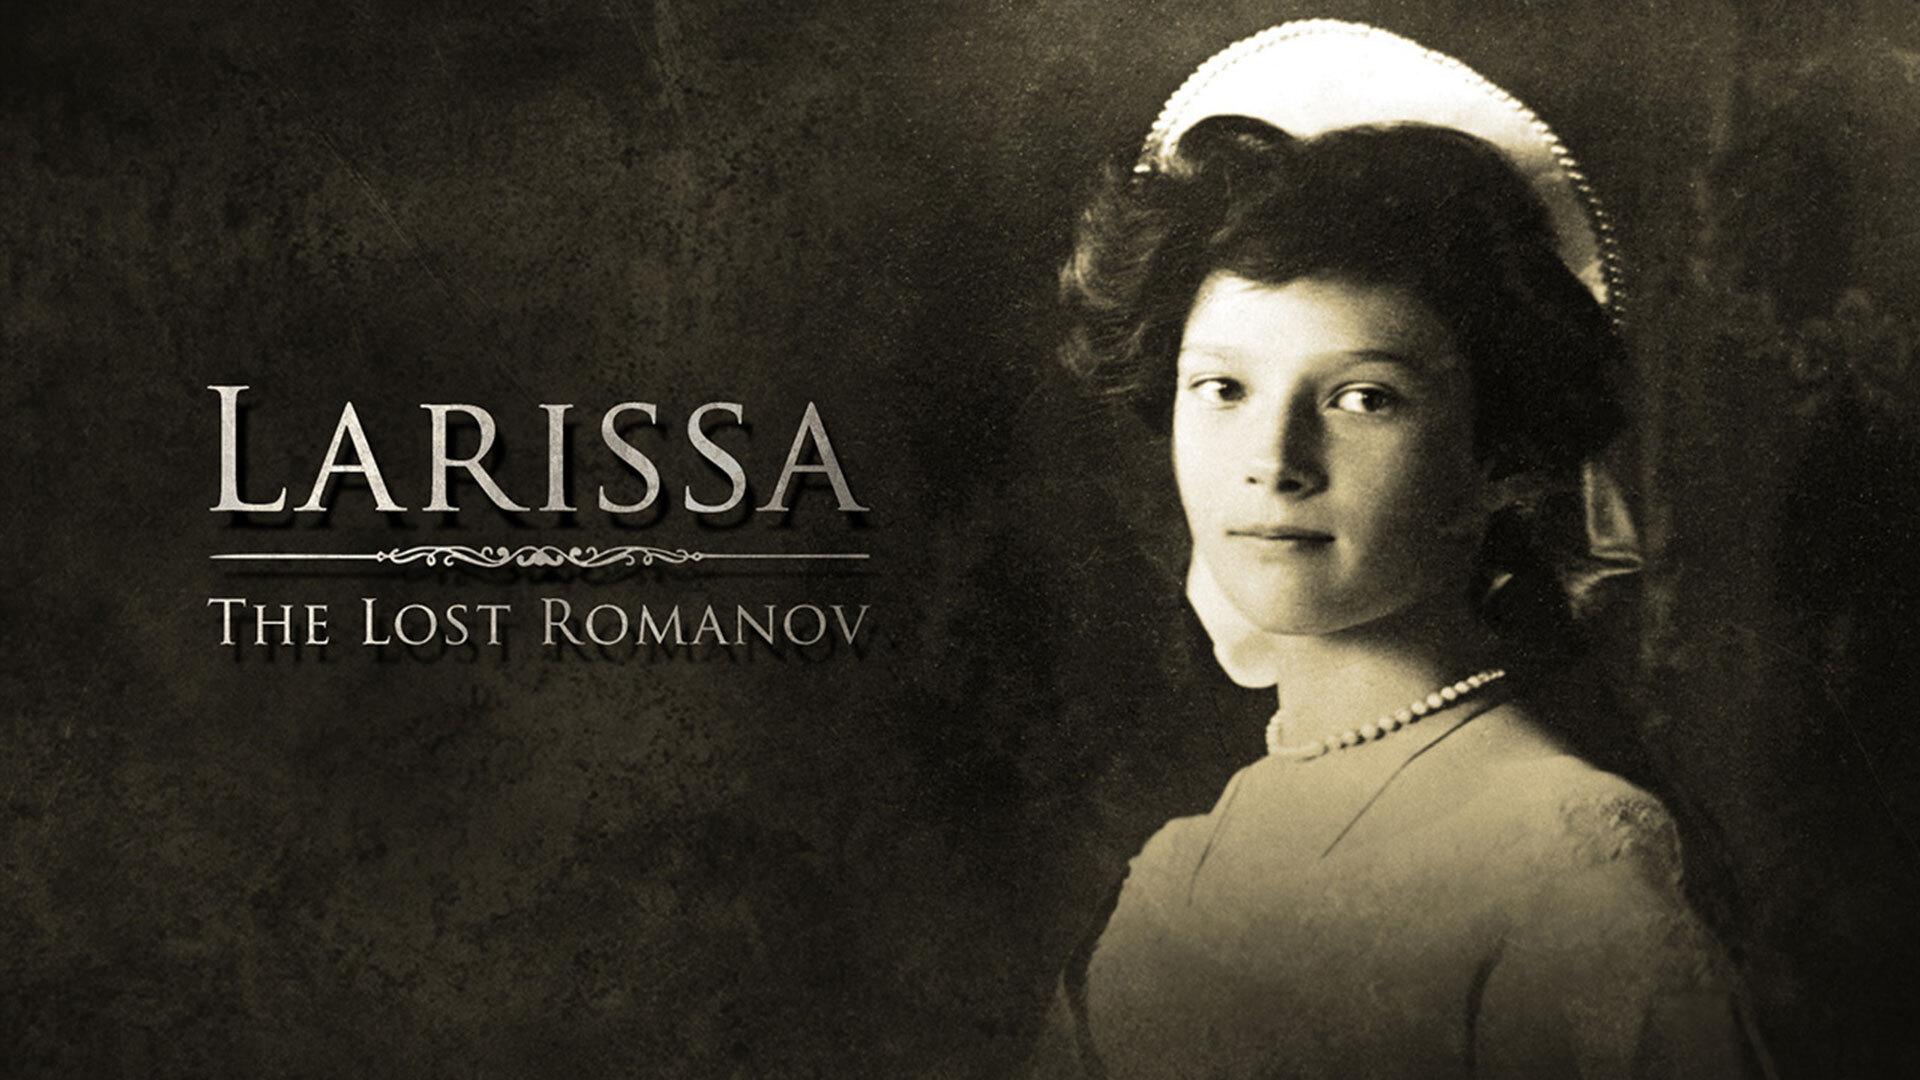 Larissa: The Lost Romanov